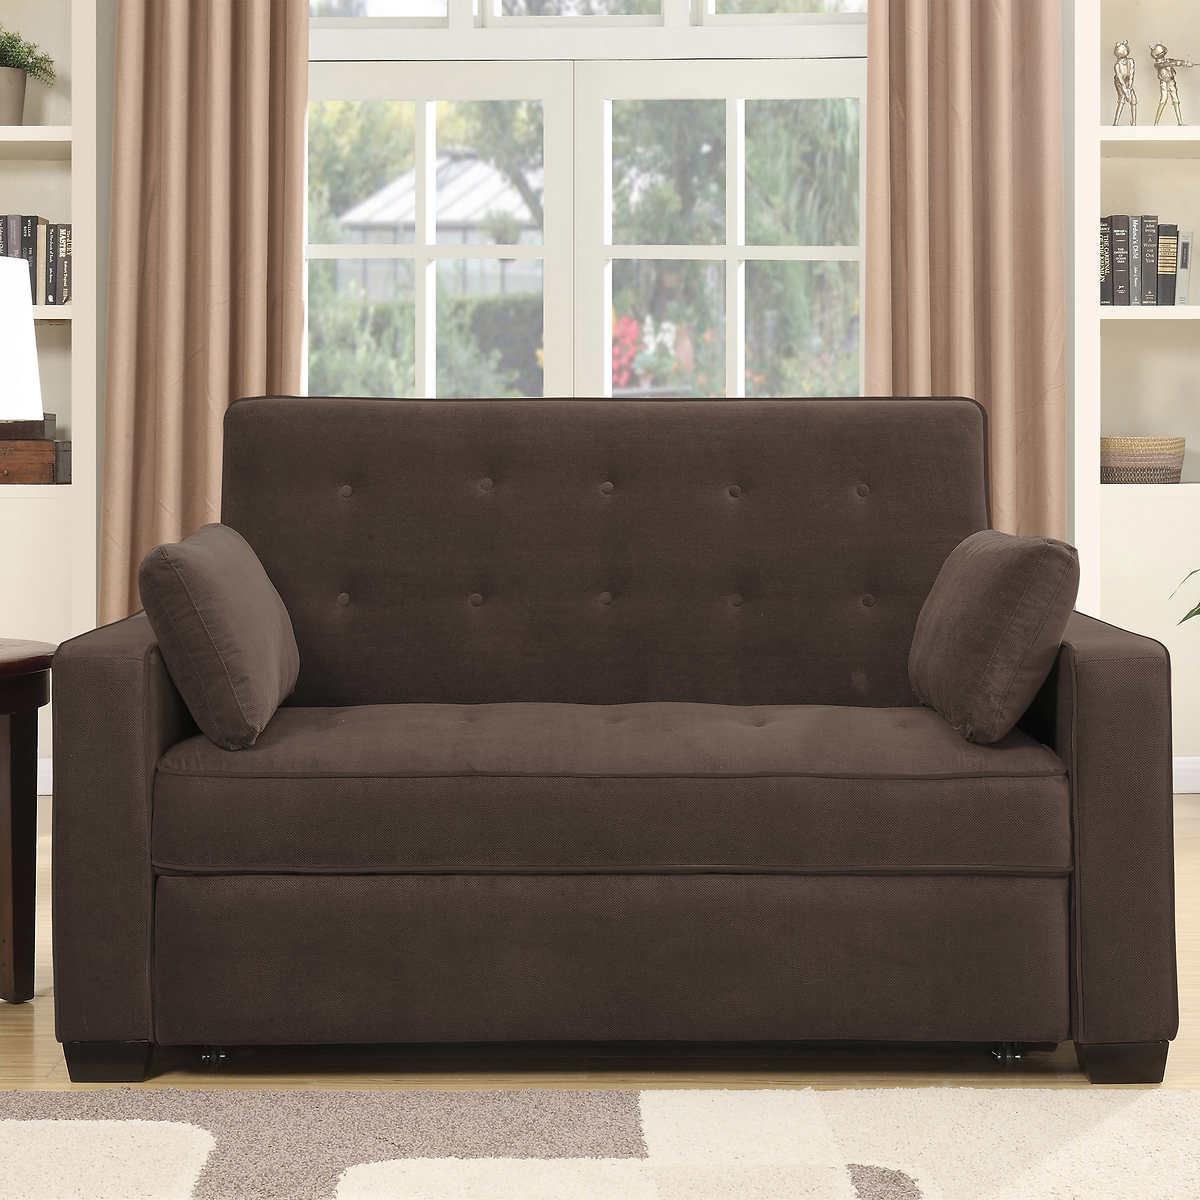 Twin Sofa Sleeper Costco   Awesome Home